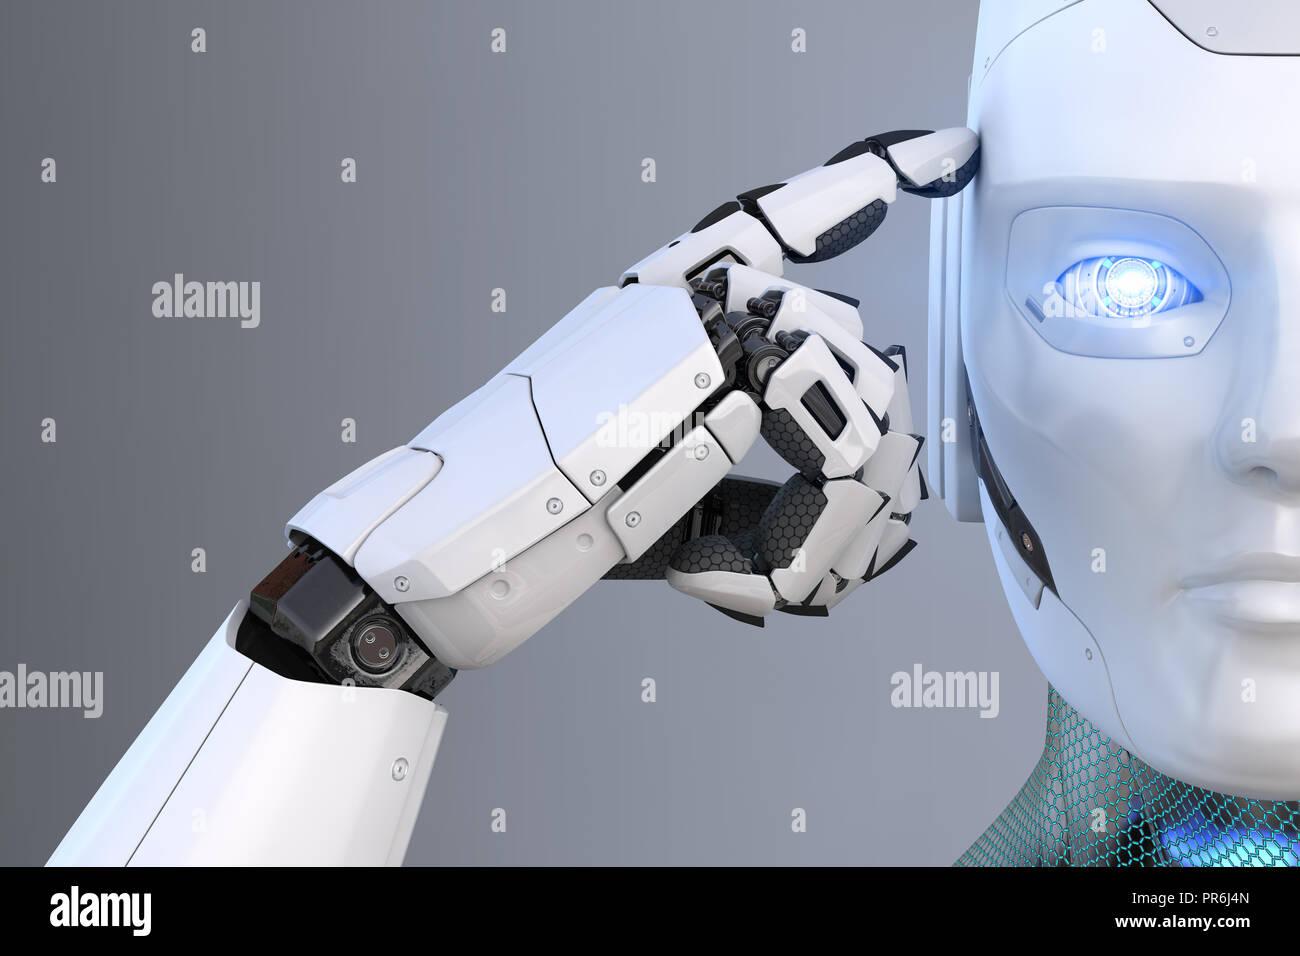 Roboter hält einen Finger in der Nähe des Kopfes. 3D illustration Stockbild